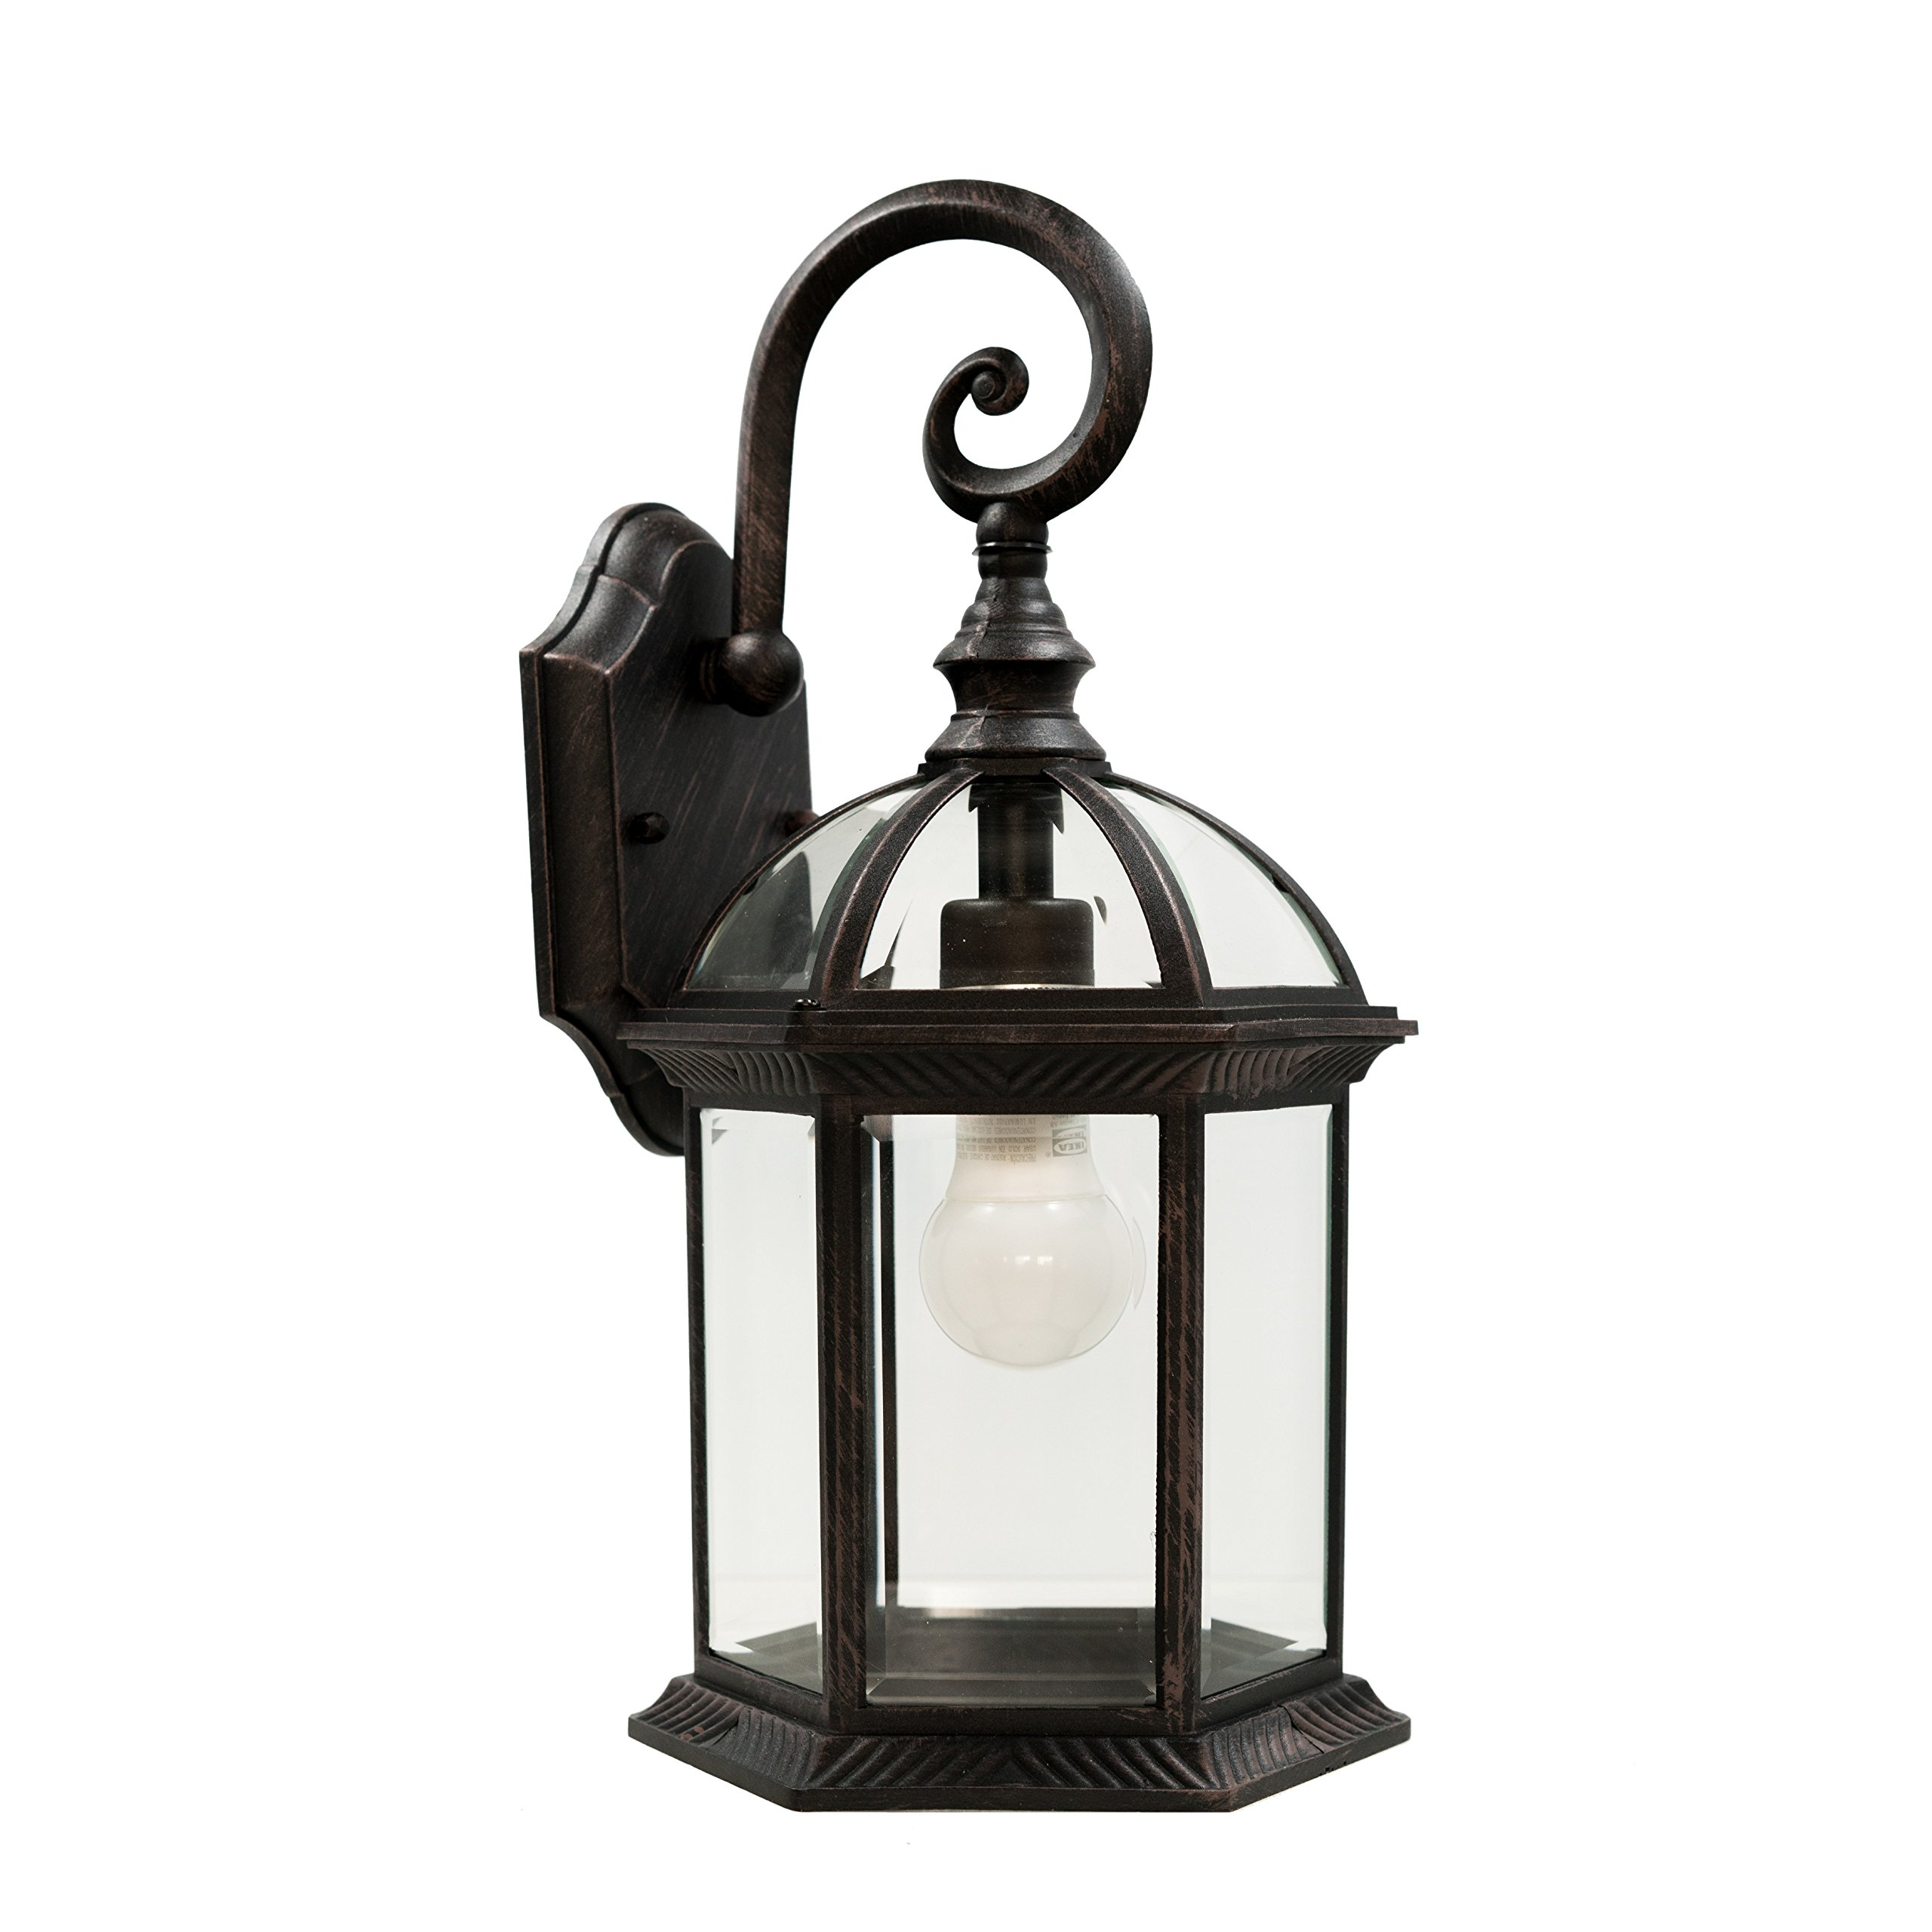 Trans Globe Lighting 4181 RT Outdoor Wentworth 15.75'' Wall Lantern, Rust